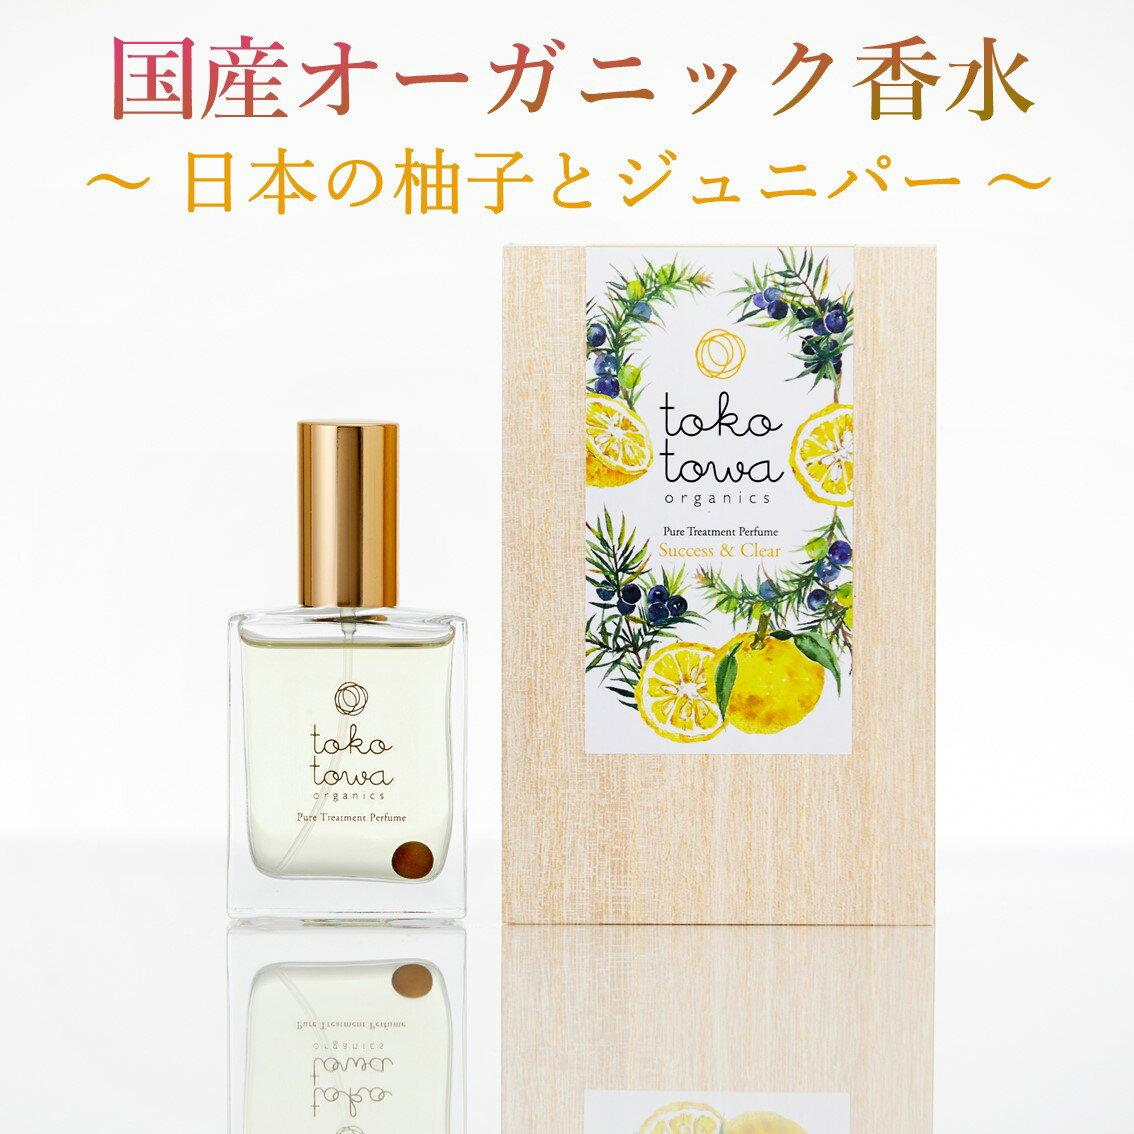 Organics Styles(オーガニックスタイルズ)『tokotowa organics ピュアトリートメントパフューム イエロー』